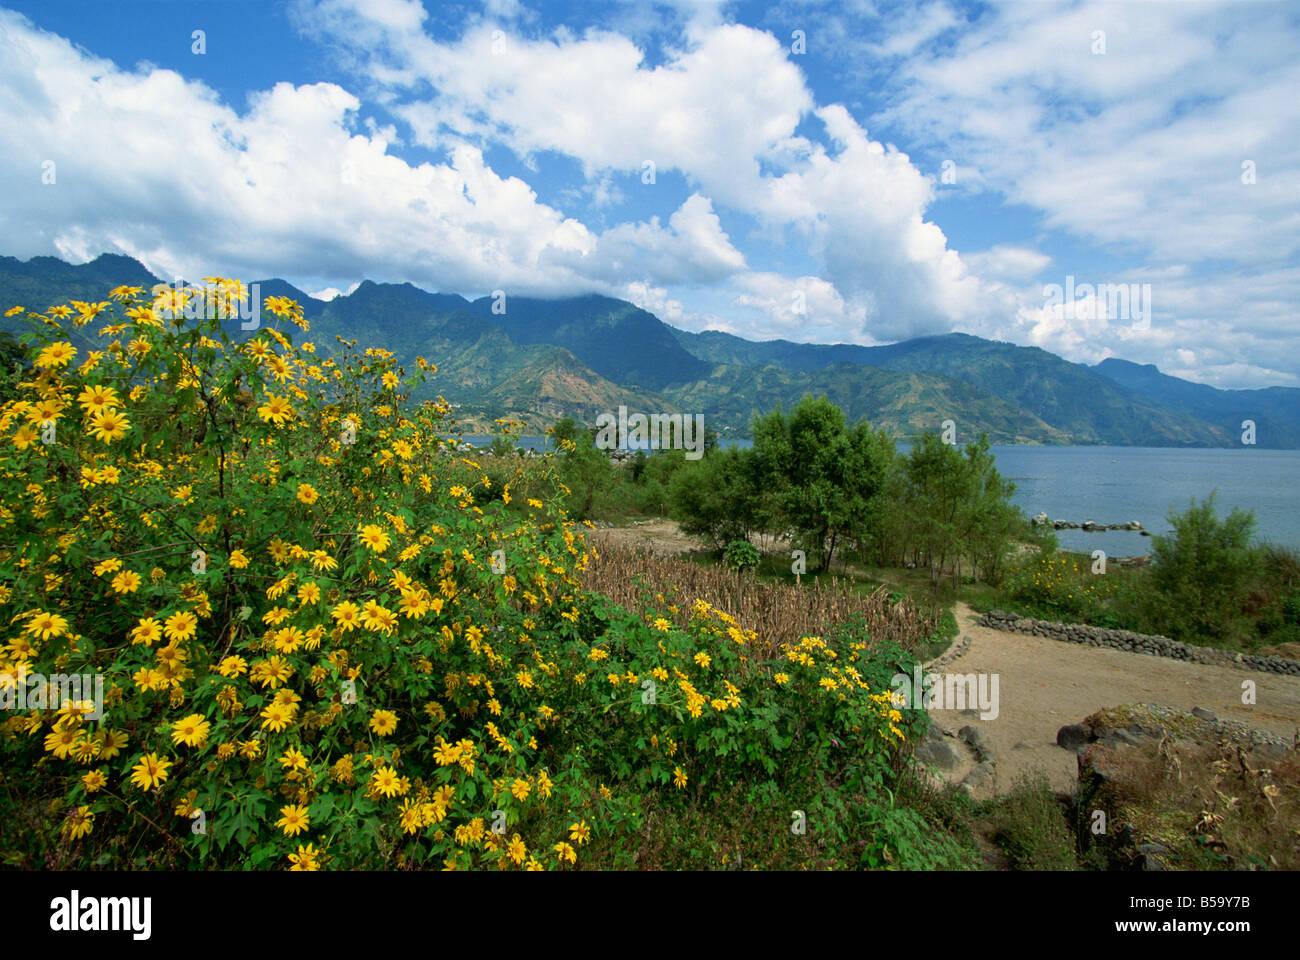 Looking from San Pedro La Laguna towards Lake Atitlan, Guatemala, Central America - Stock Image